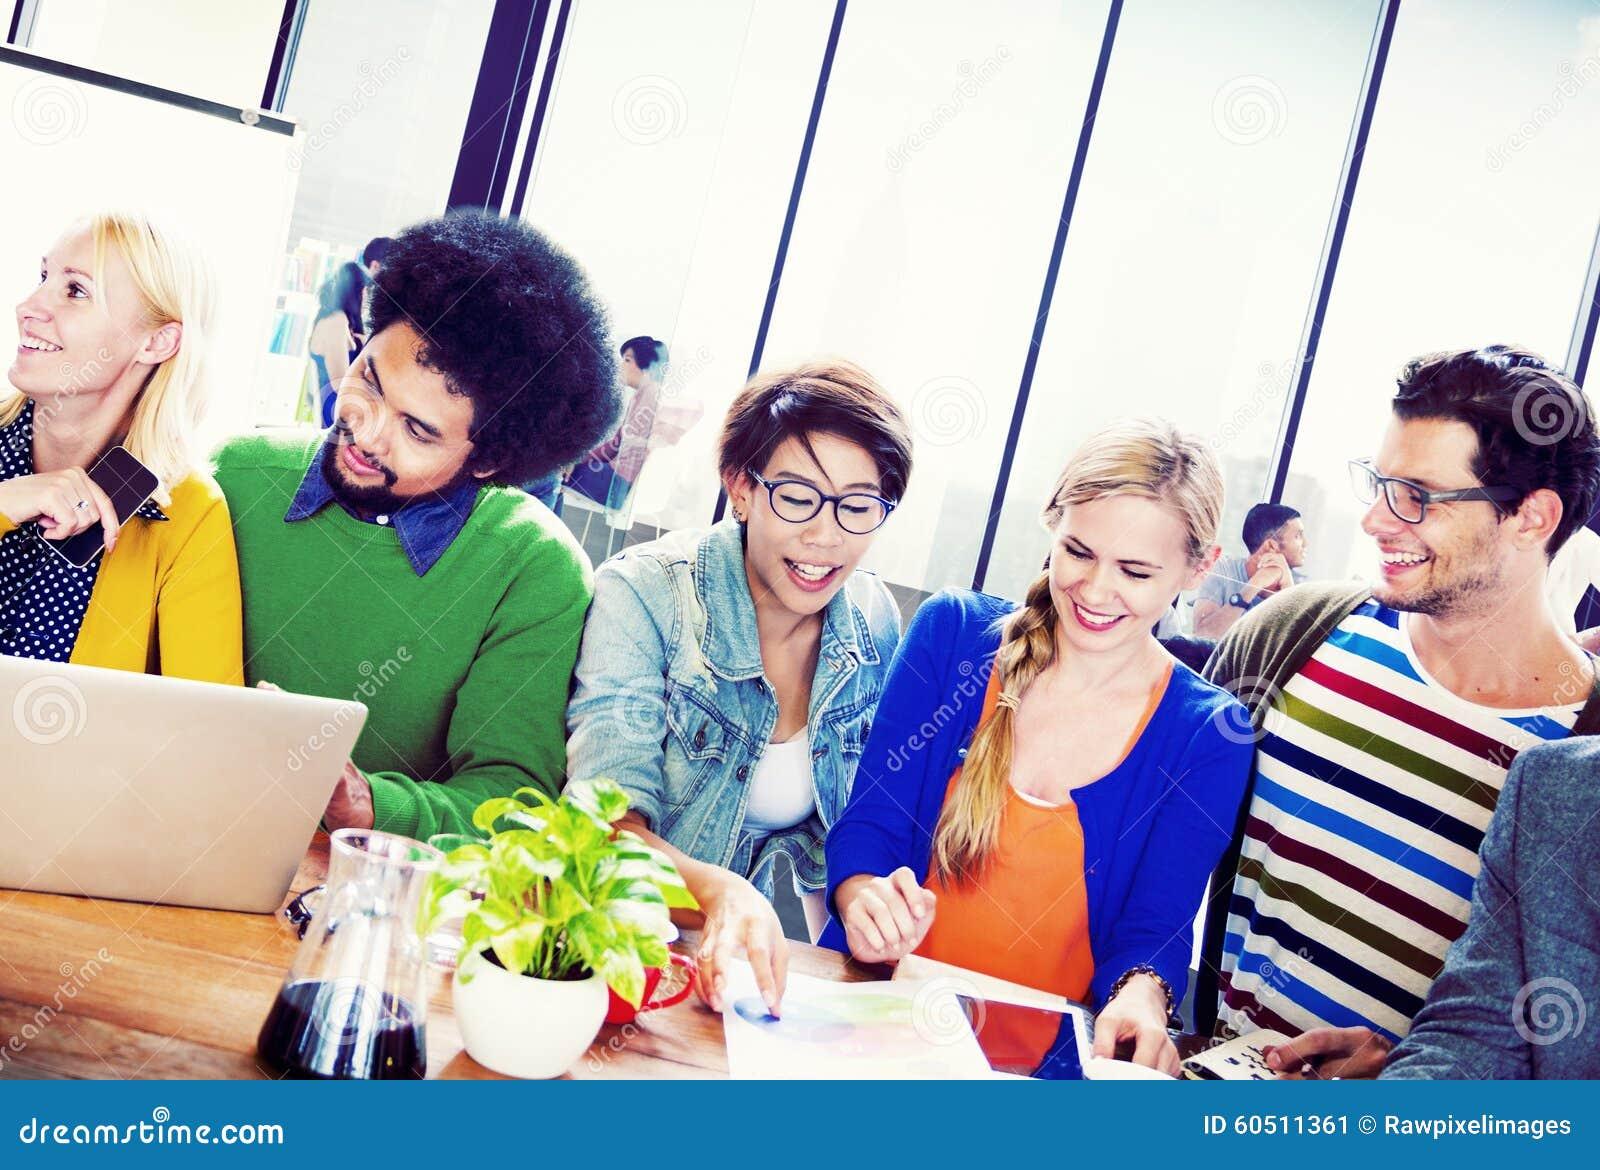 Students University Learning Communication Concept